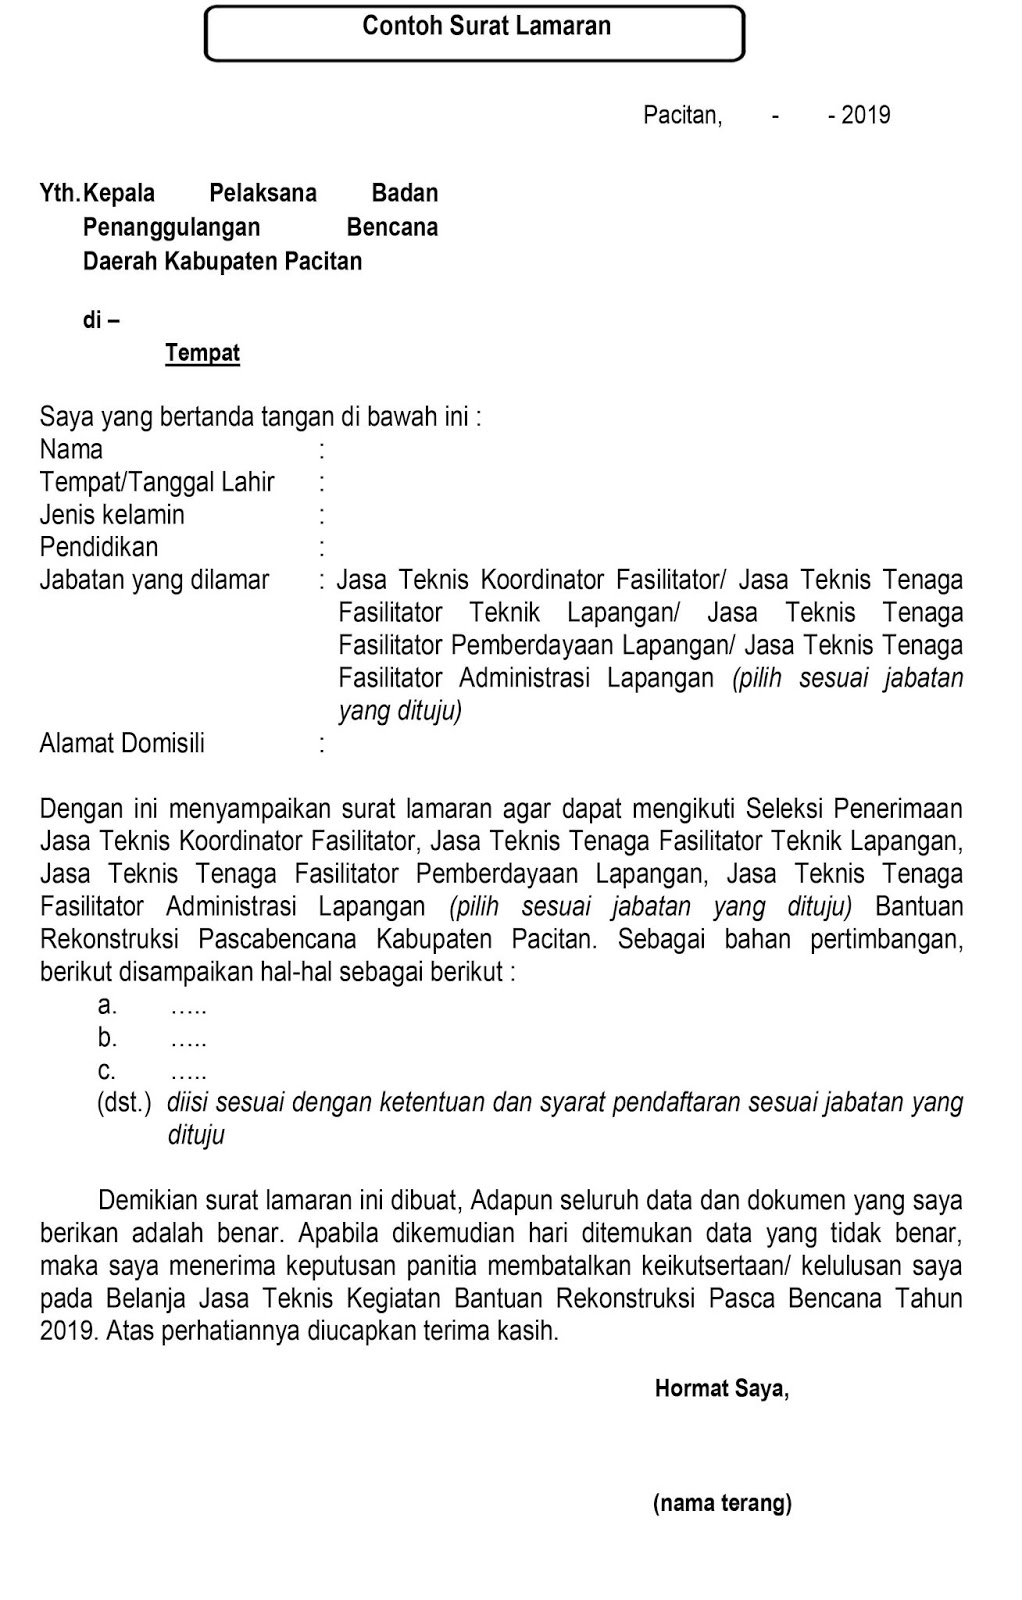 Lowongan Kerja Bpbd Kabupaten Pacitan Tahun 2019